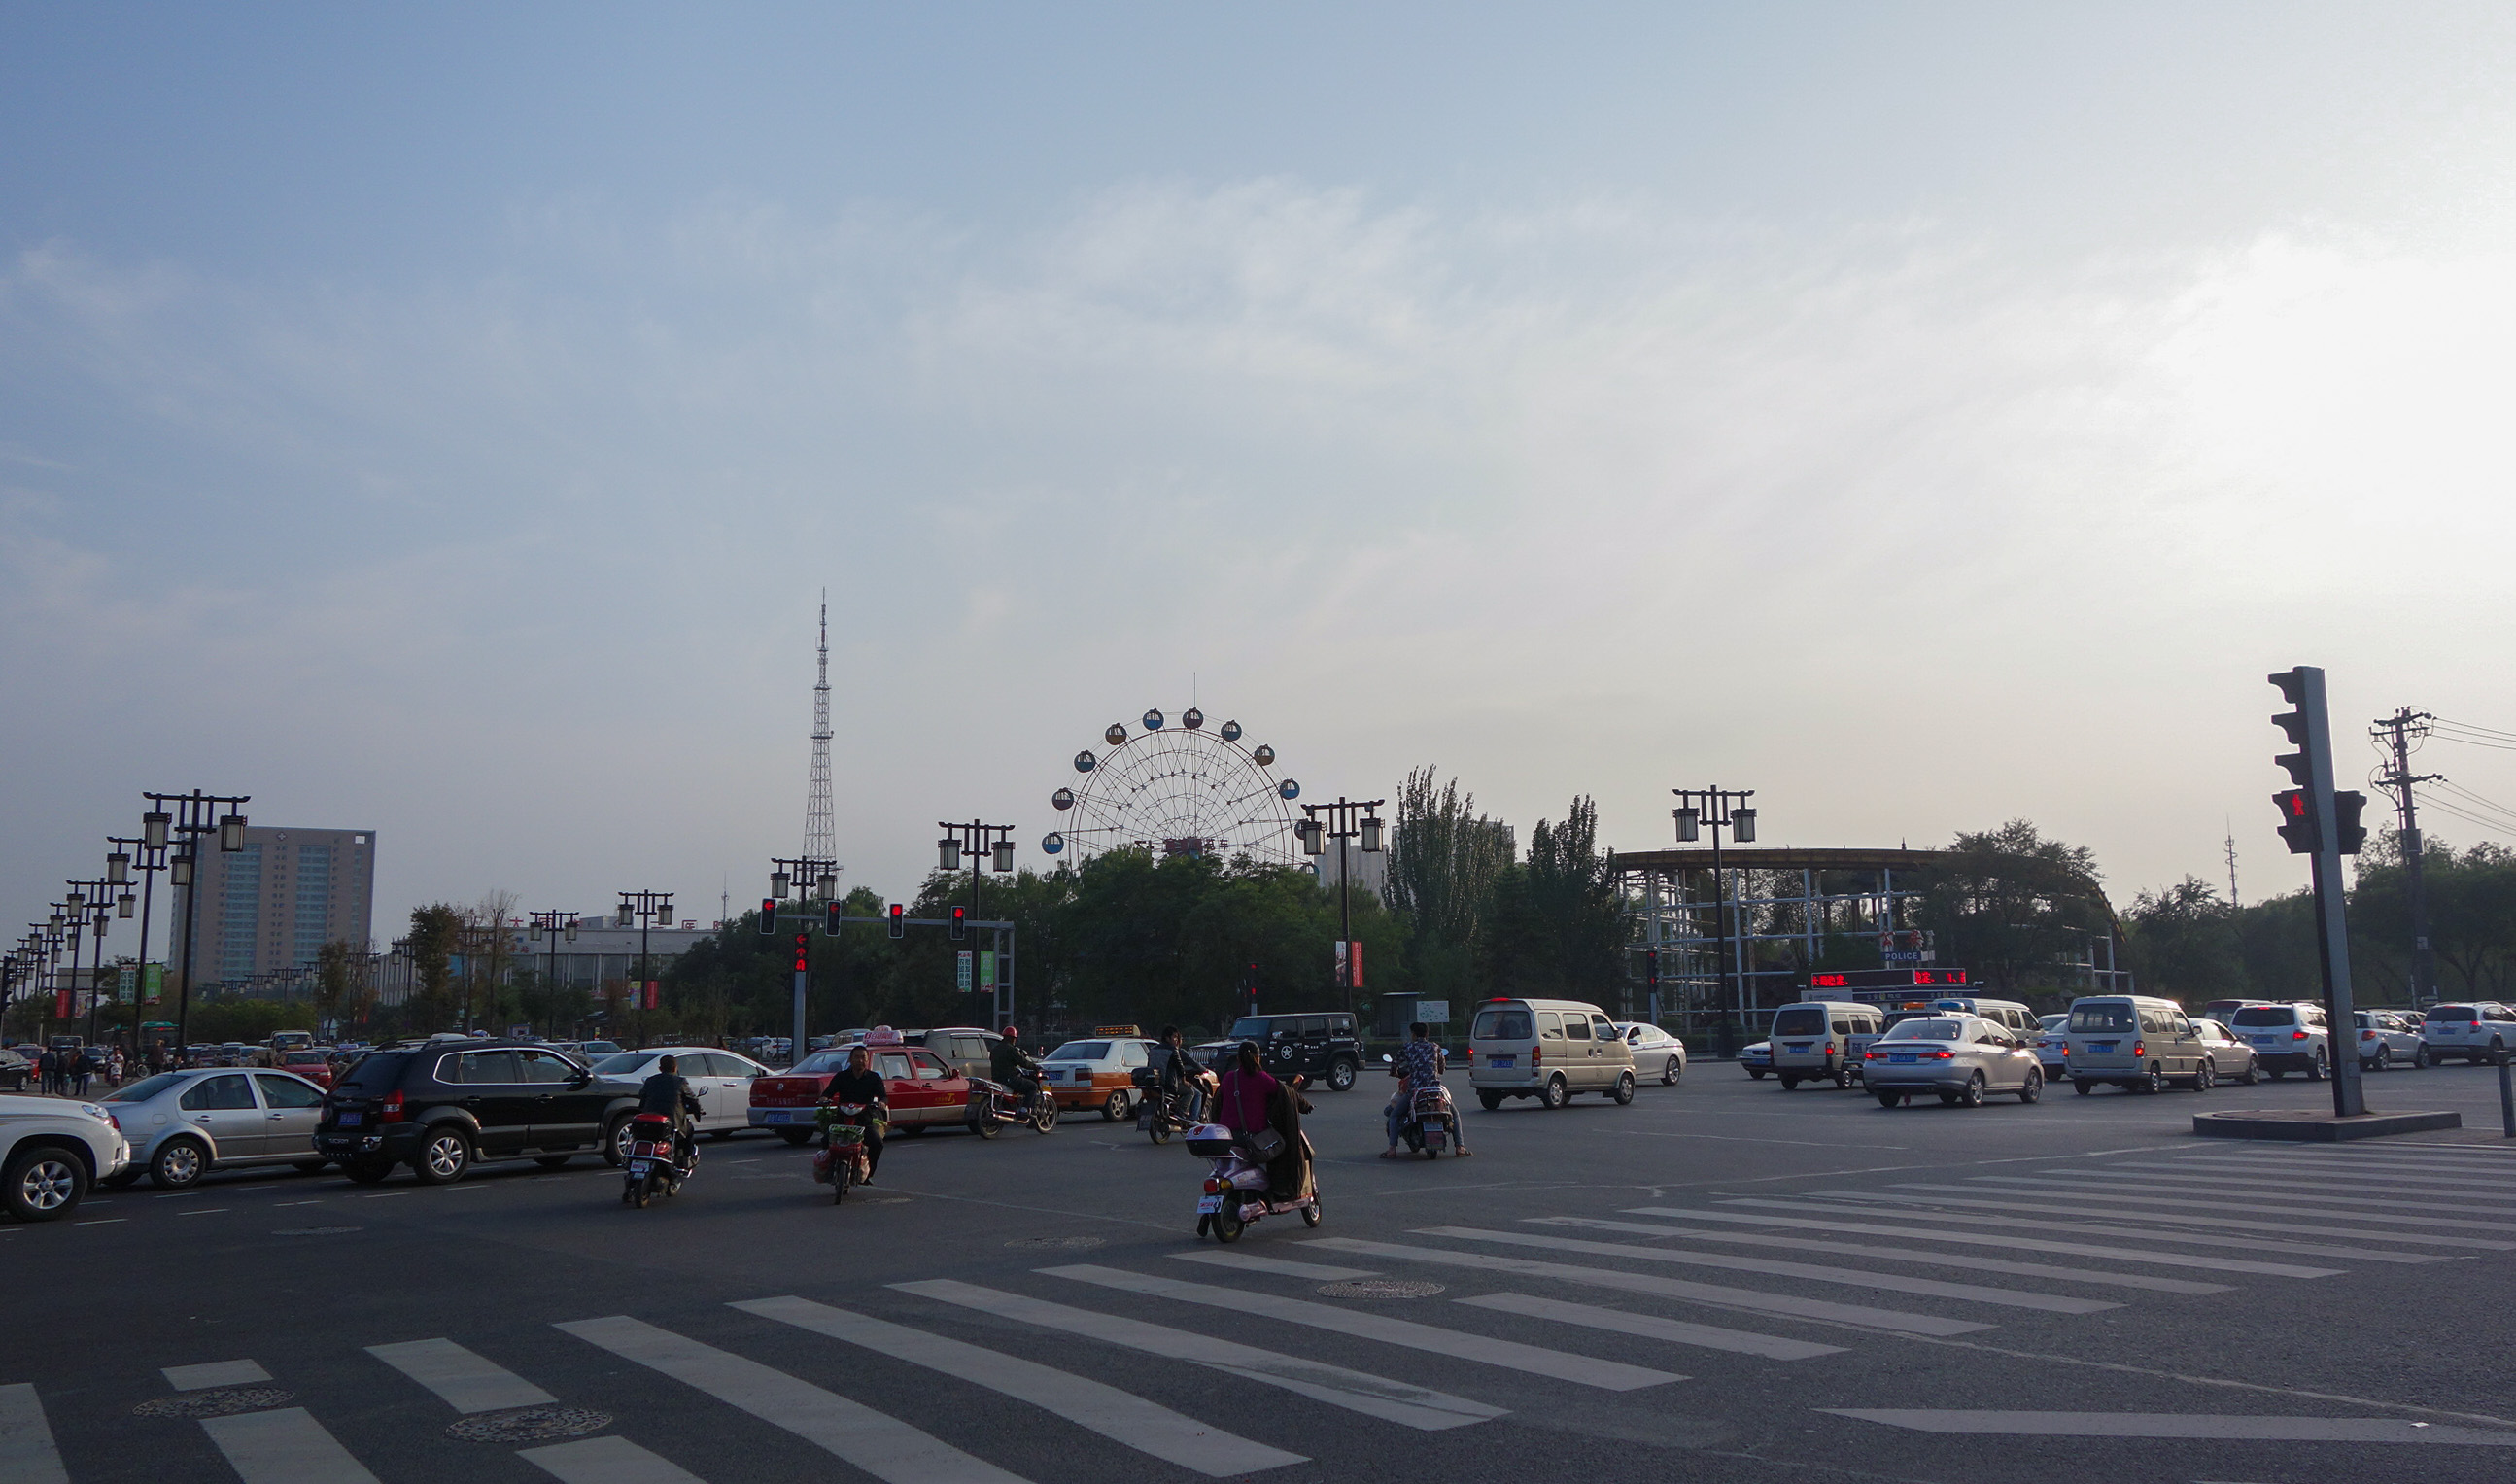 Chine Expat datant